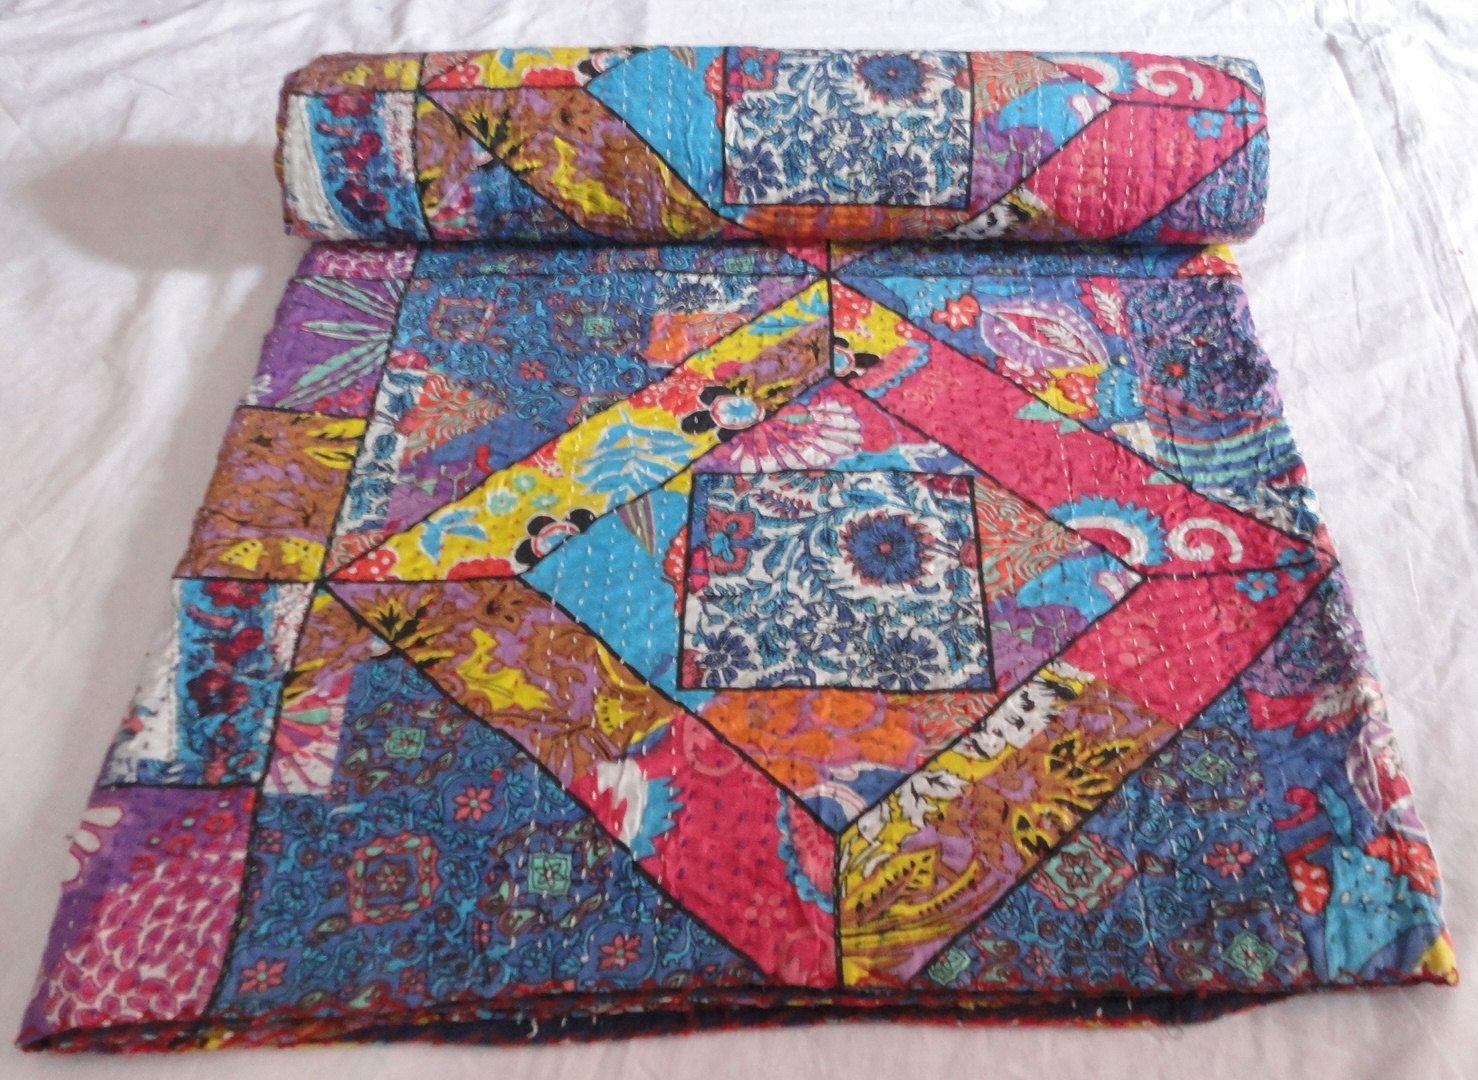 Indian Handmade flower printed Kantha Quilt Throw Ralli designer printed Gudari bed sheet floral kantha throw bedspread by textileszone on Etsy